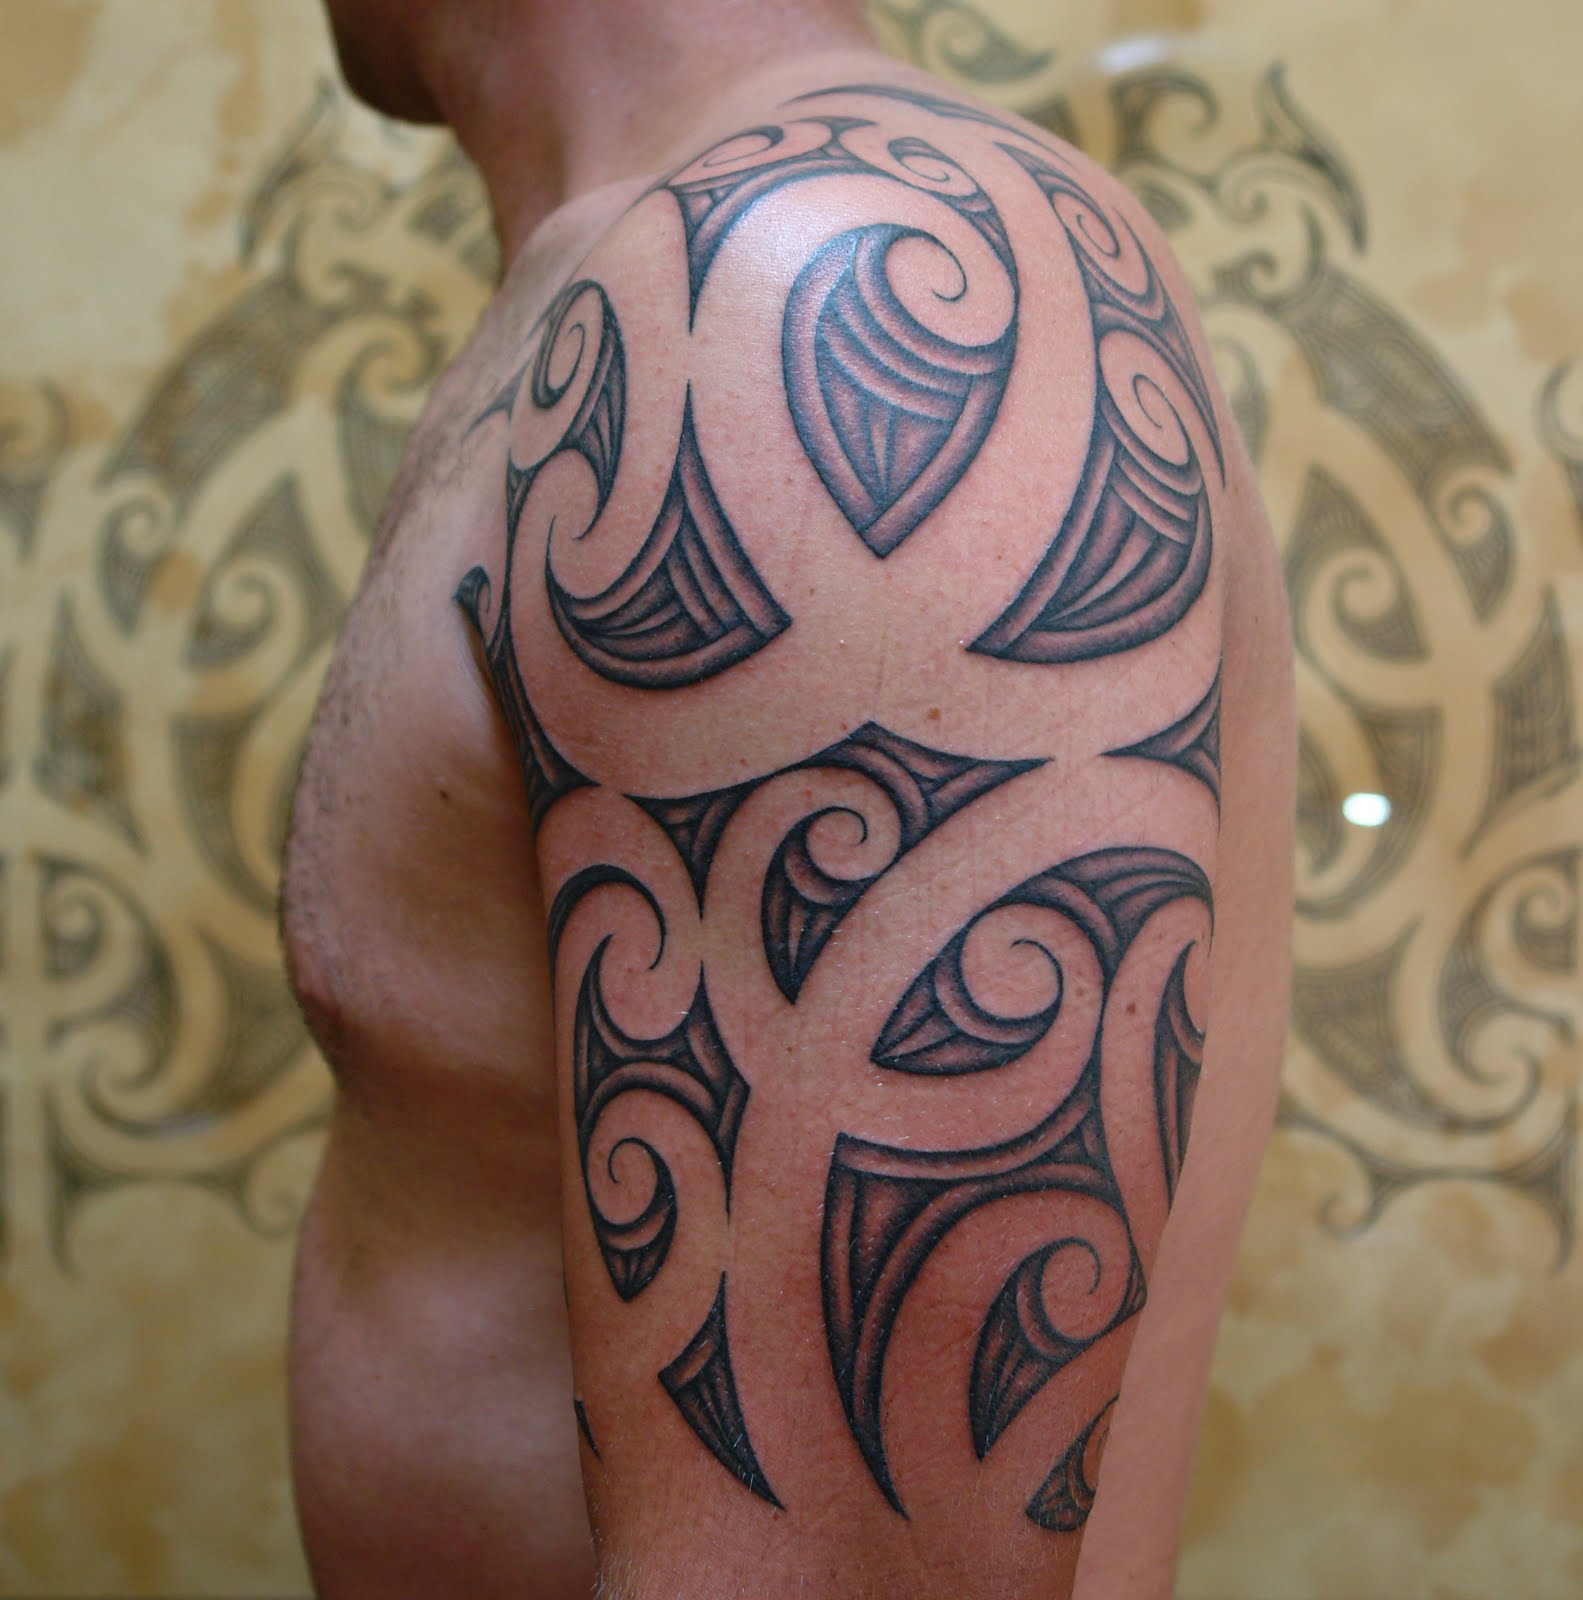 body art world tattoos maori tattoo art and traditional maori tattoos. Black Bedroom Furniture Sets. Home Design Ideas